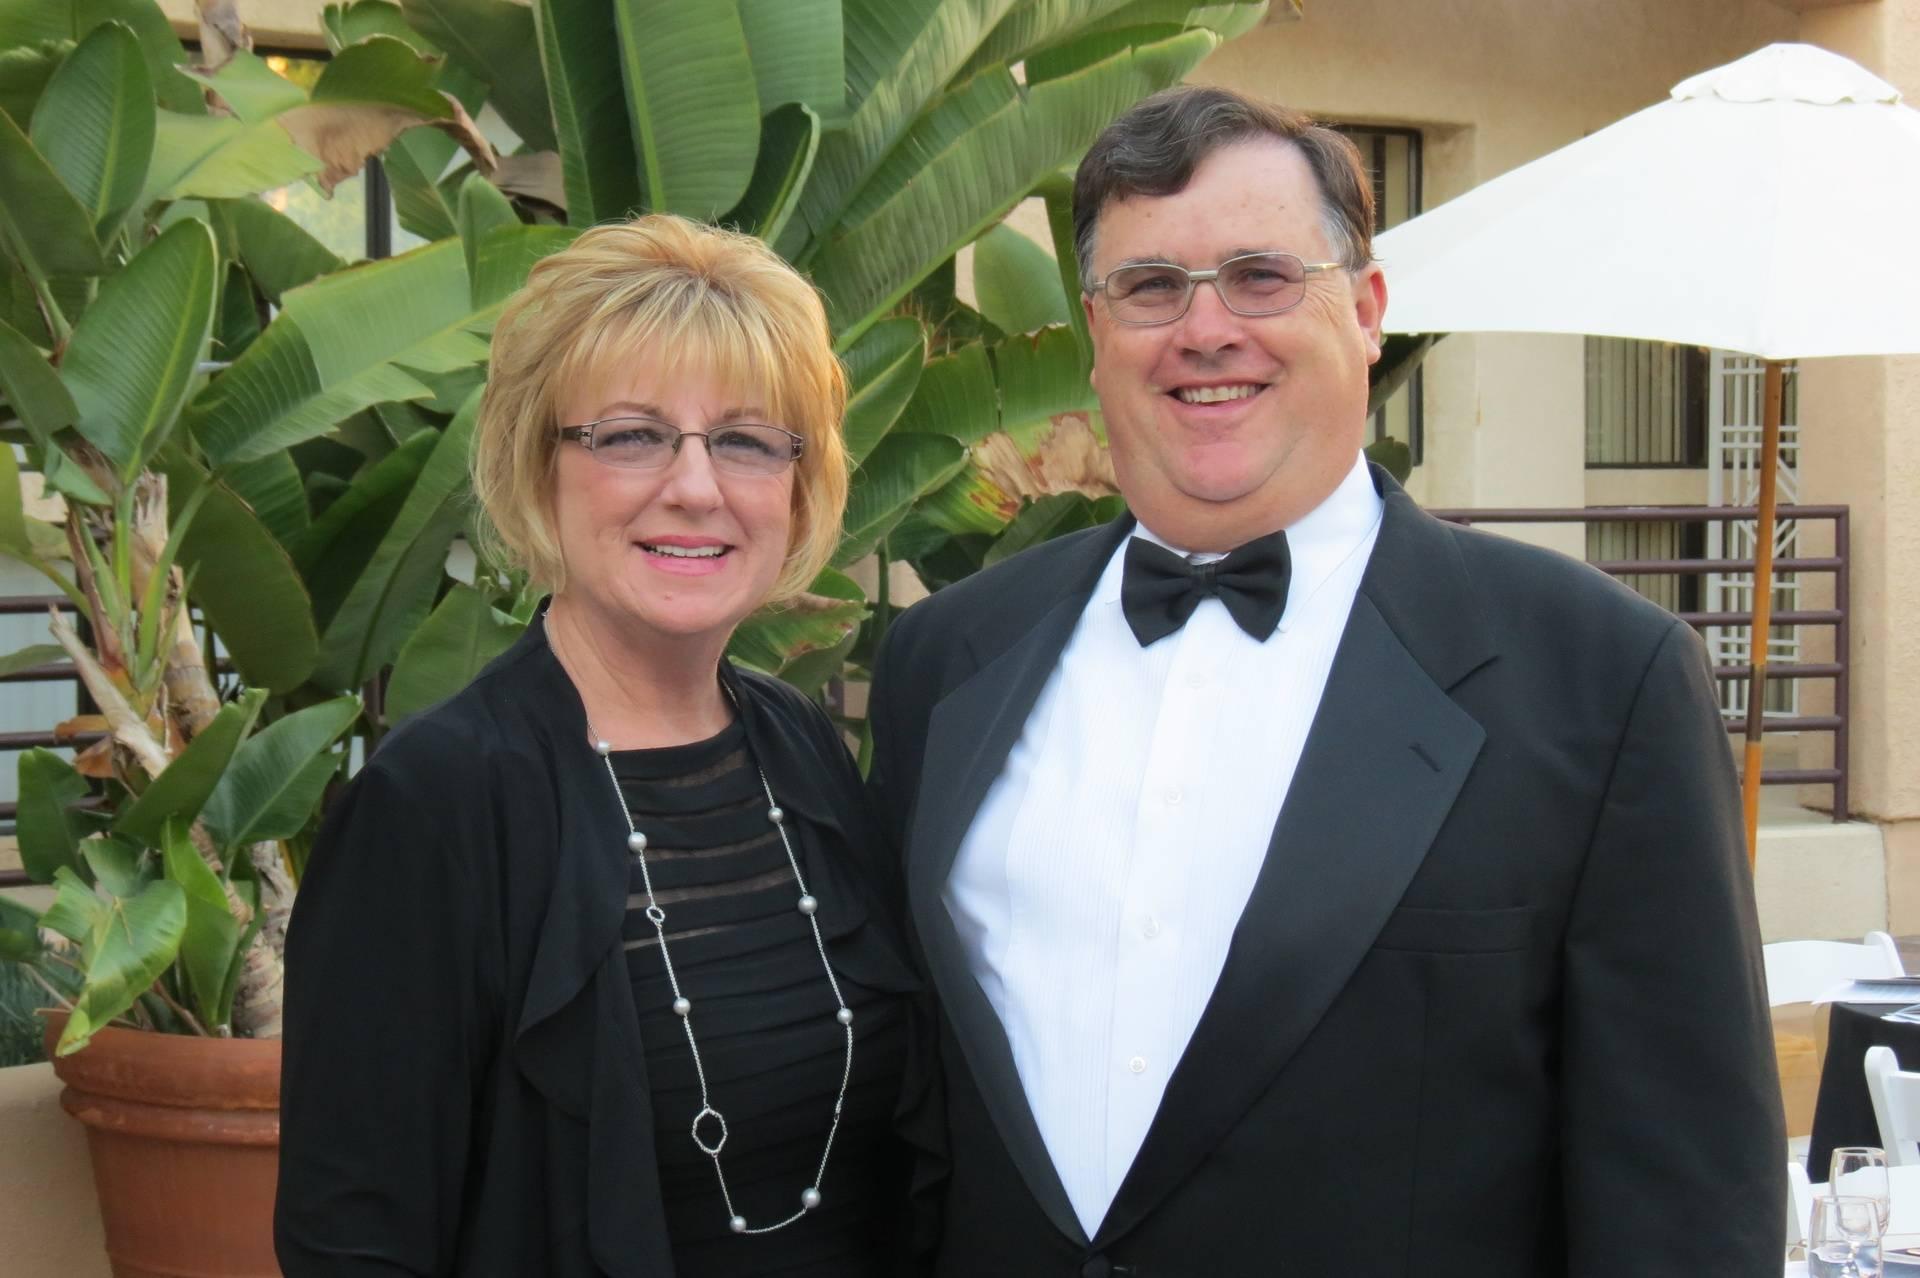 Craig Rousselot, Momentum Program Director